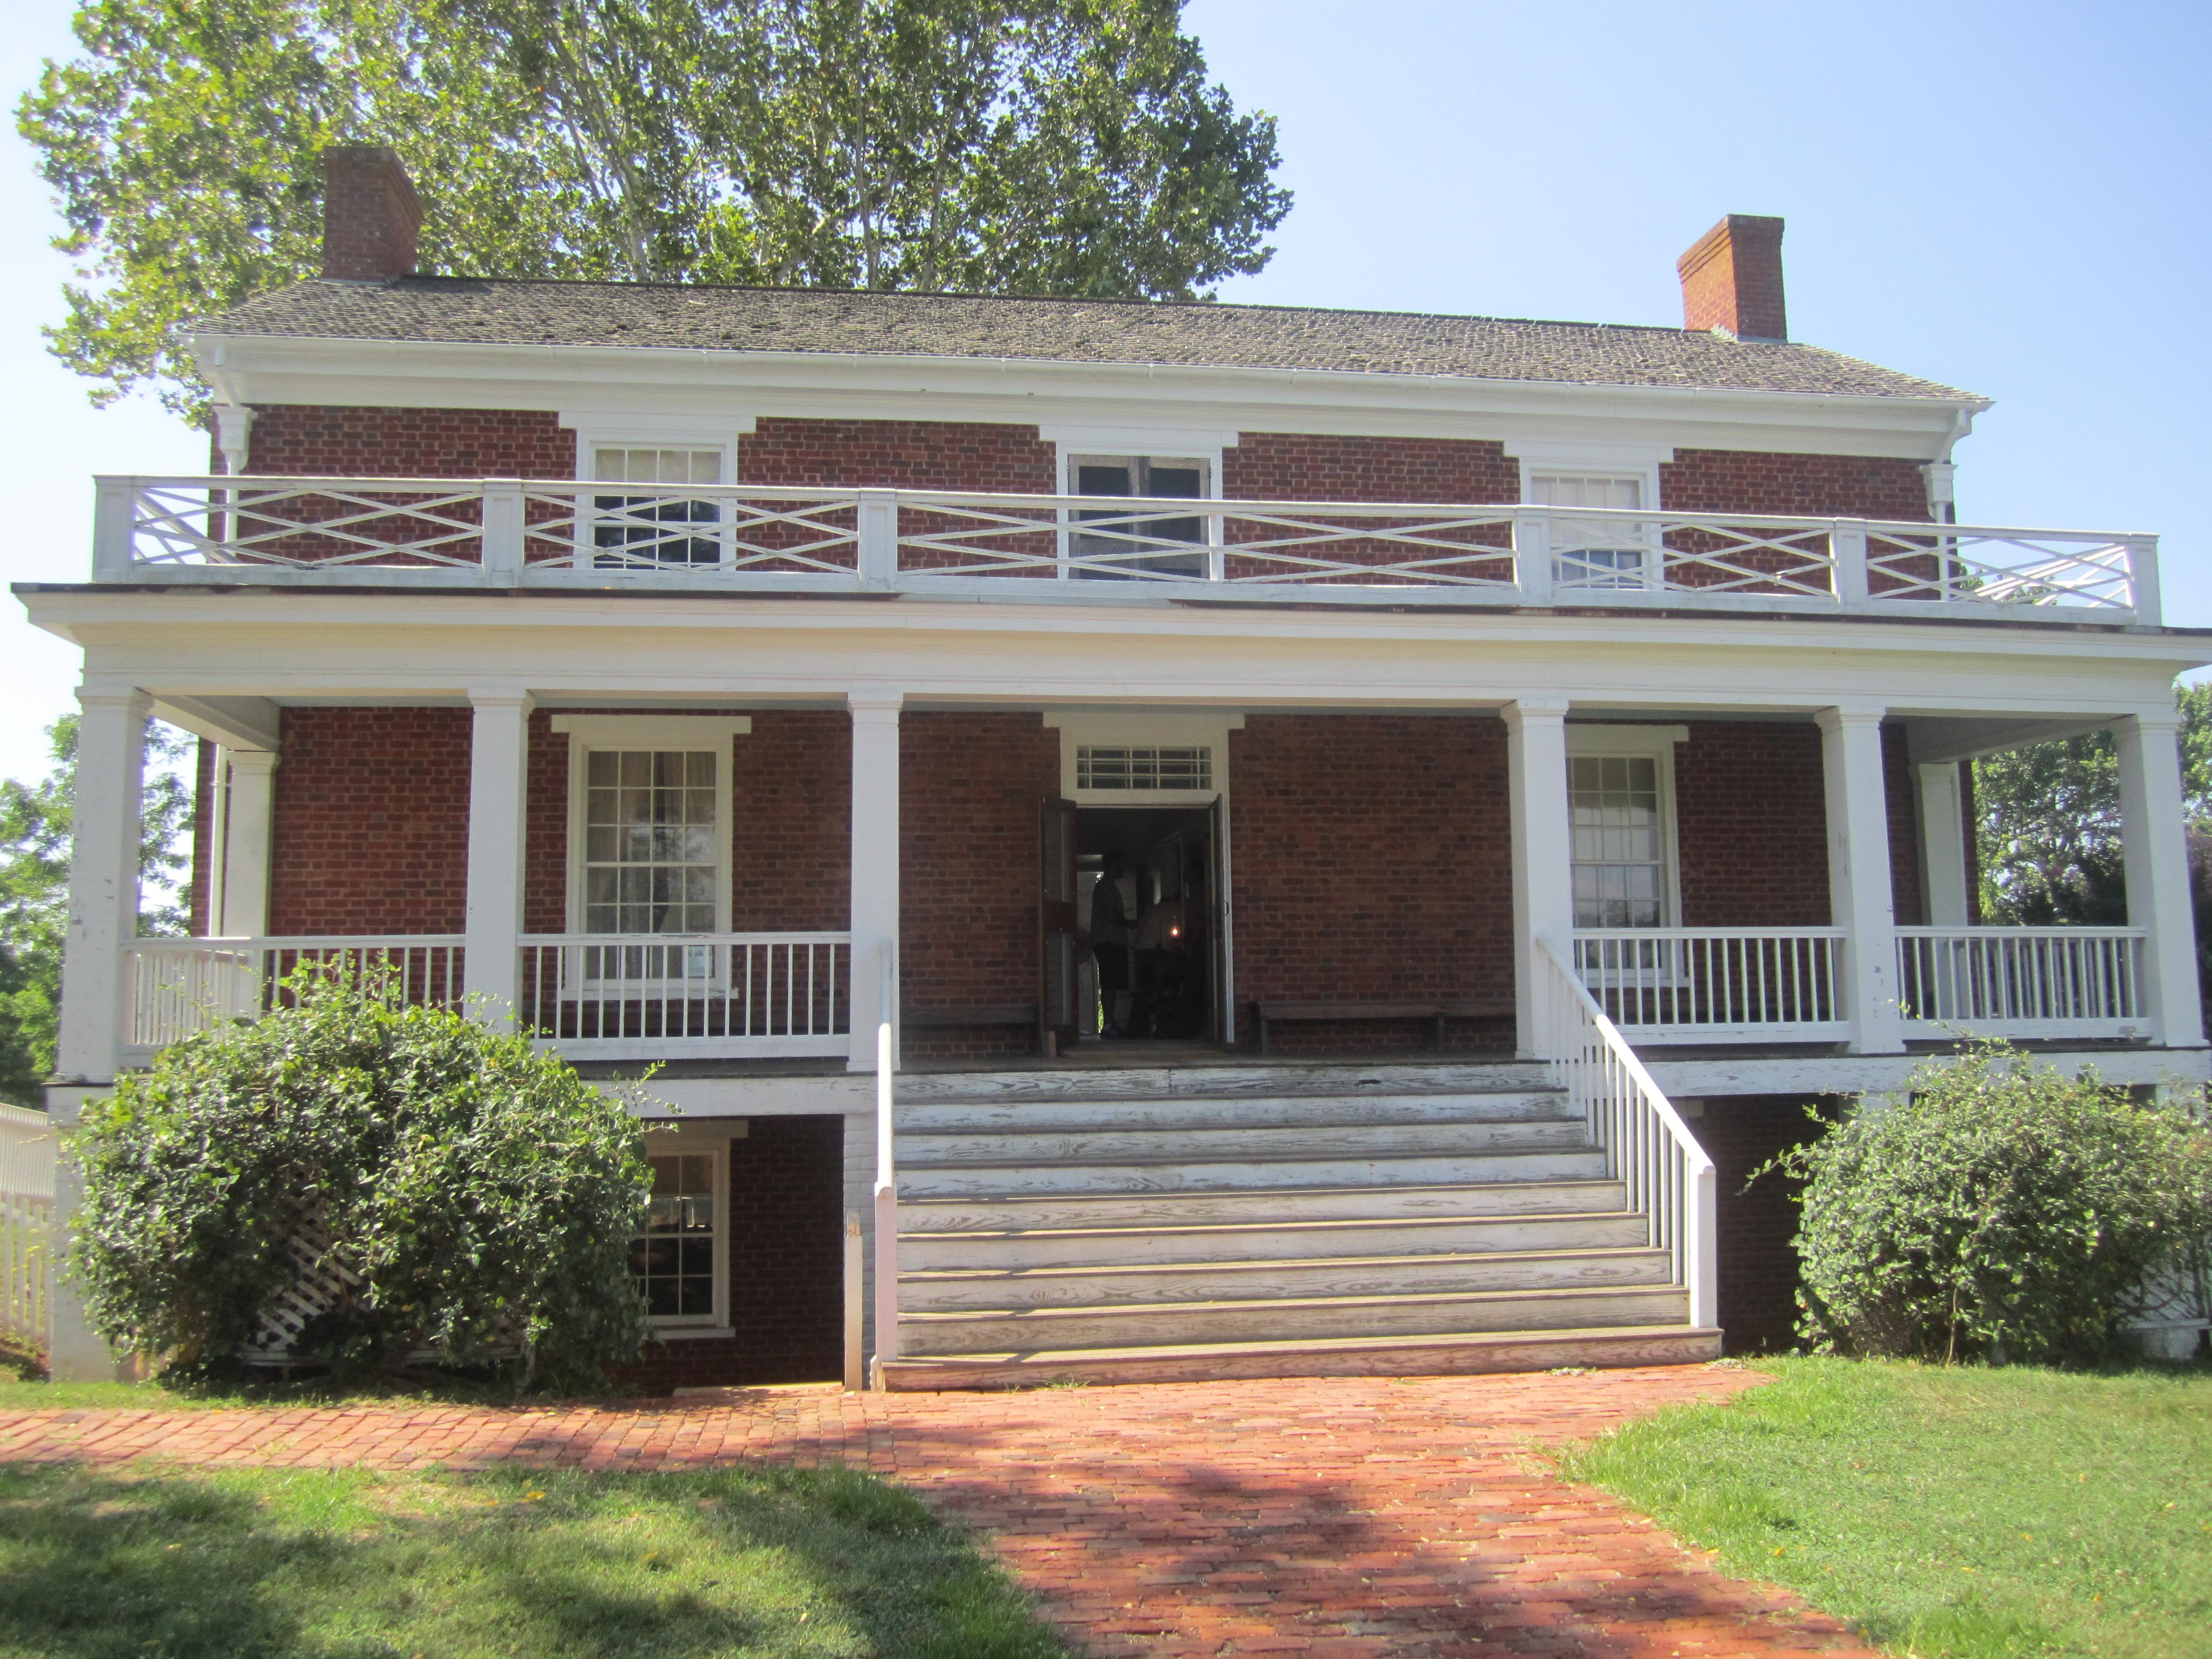 File Mclean House At Appomattox Va Img 4136 Jpg